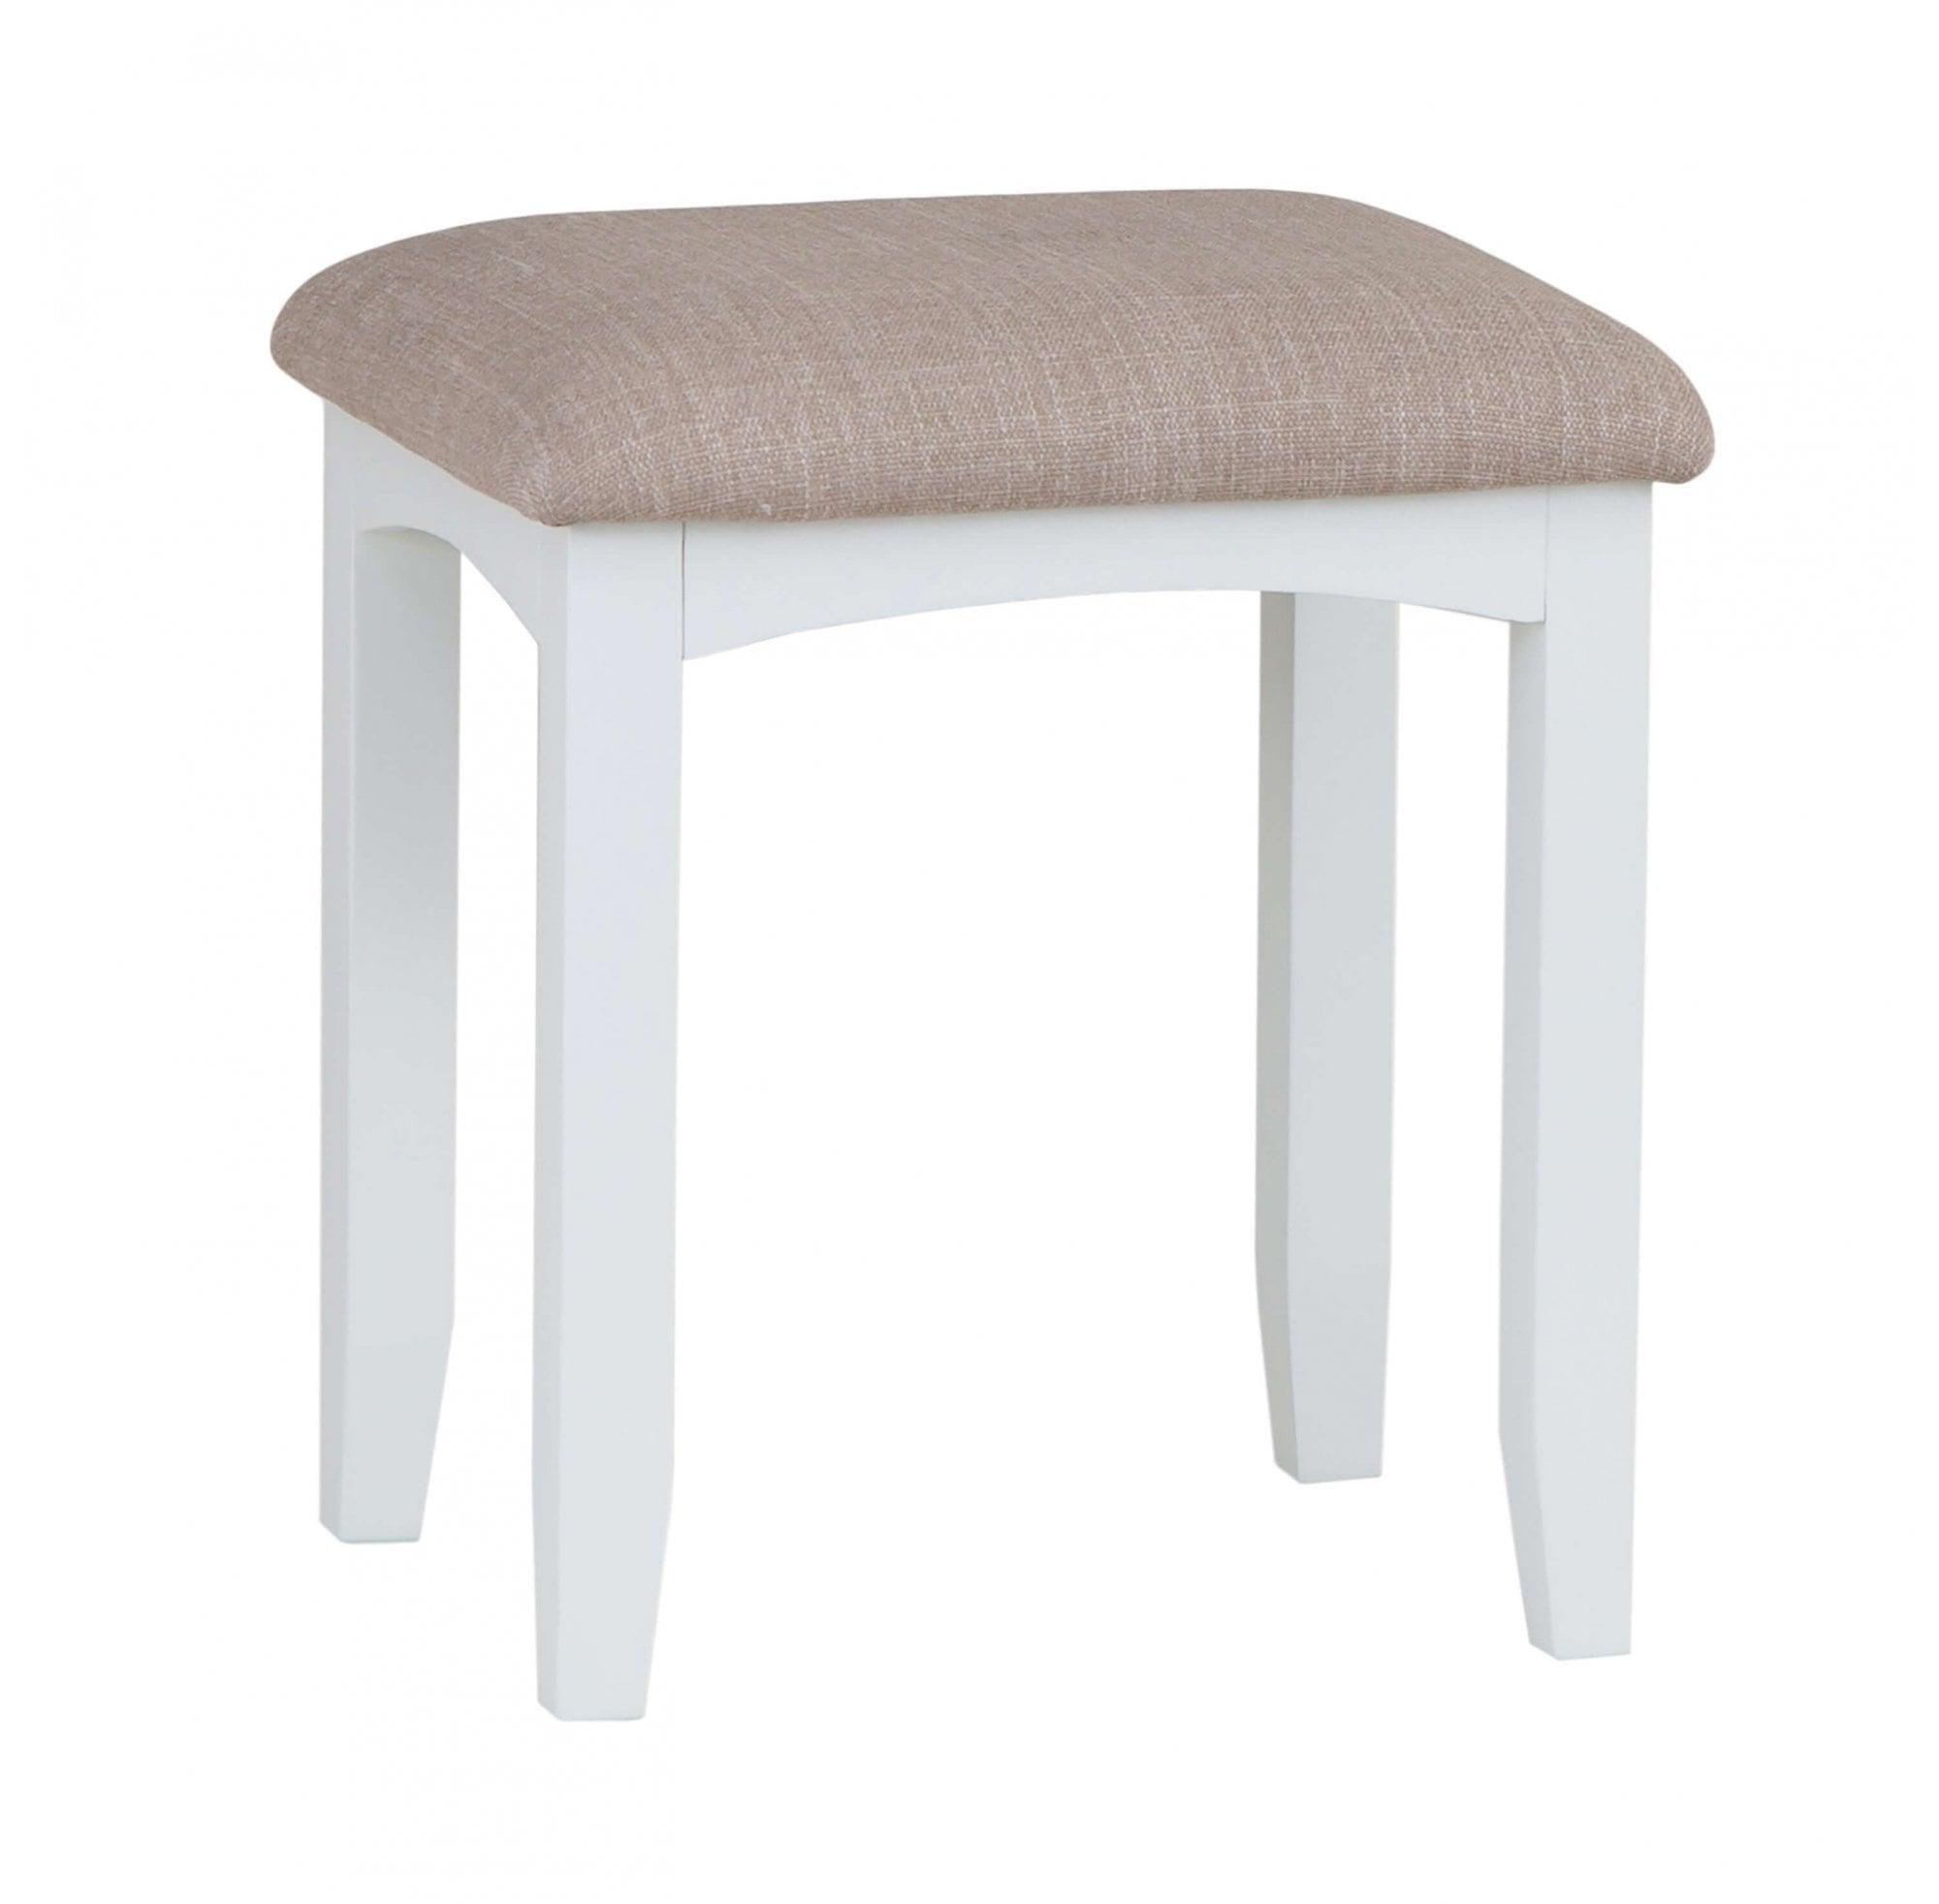 Langbridge White Bedroom Stool Furniture Sale From Readers Interiors Uk